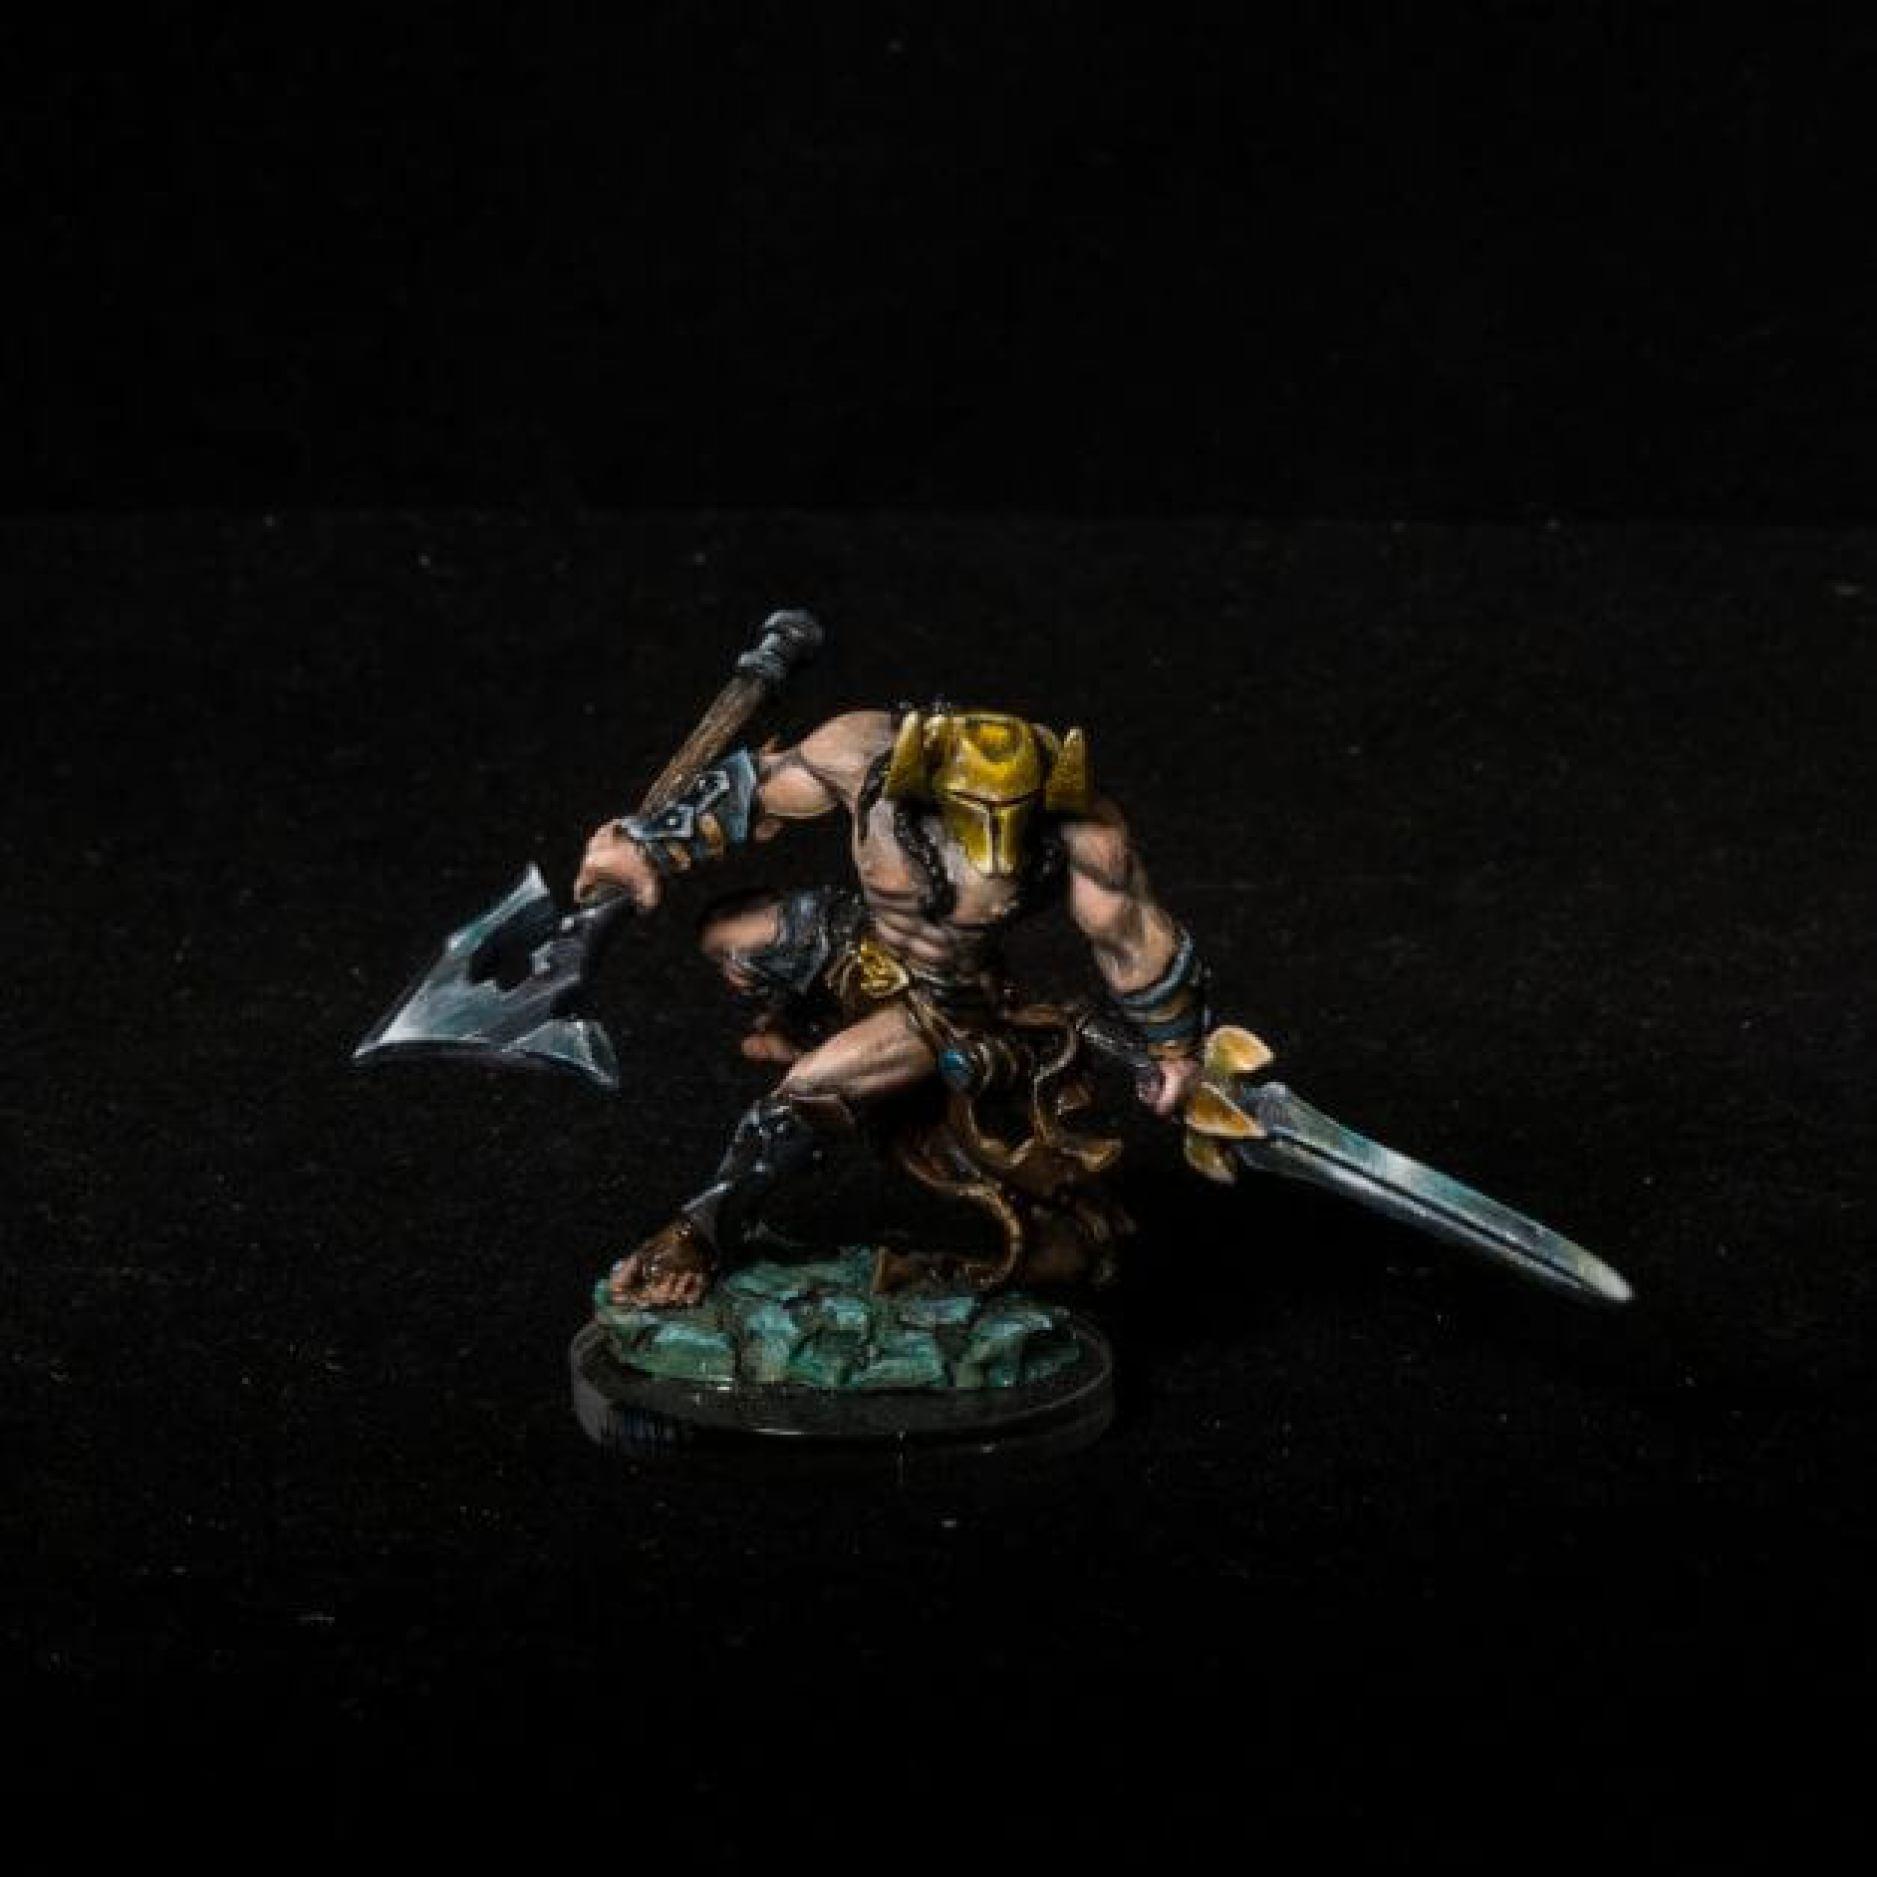 Ilkhan the Barbarian